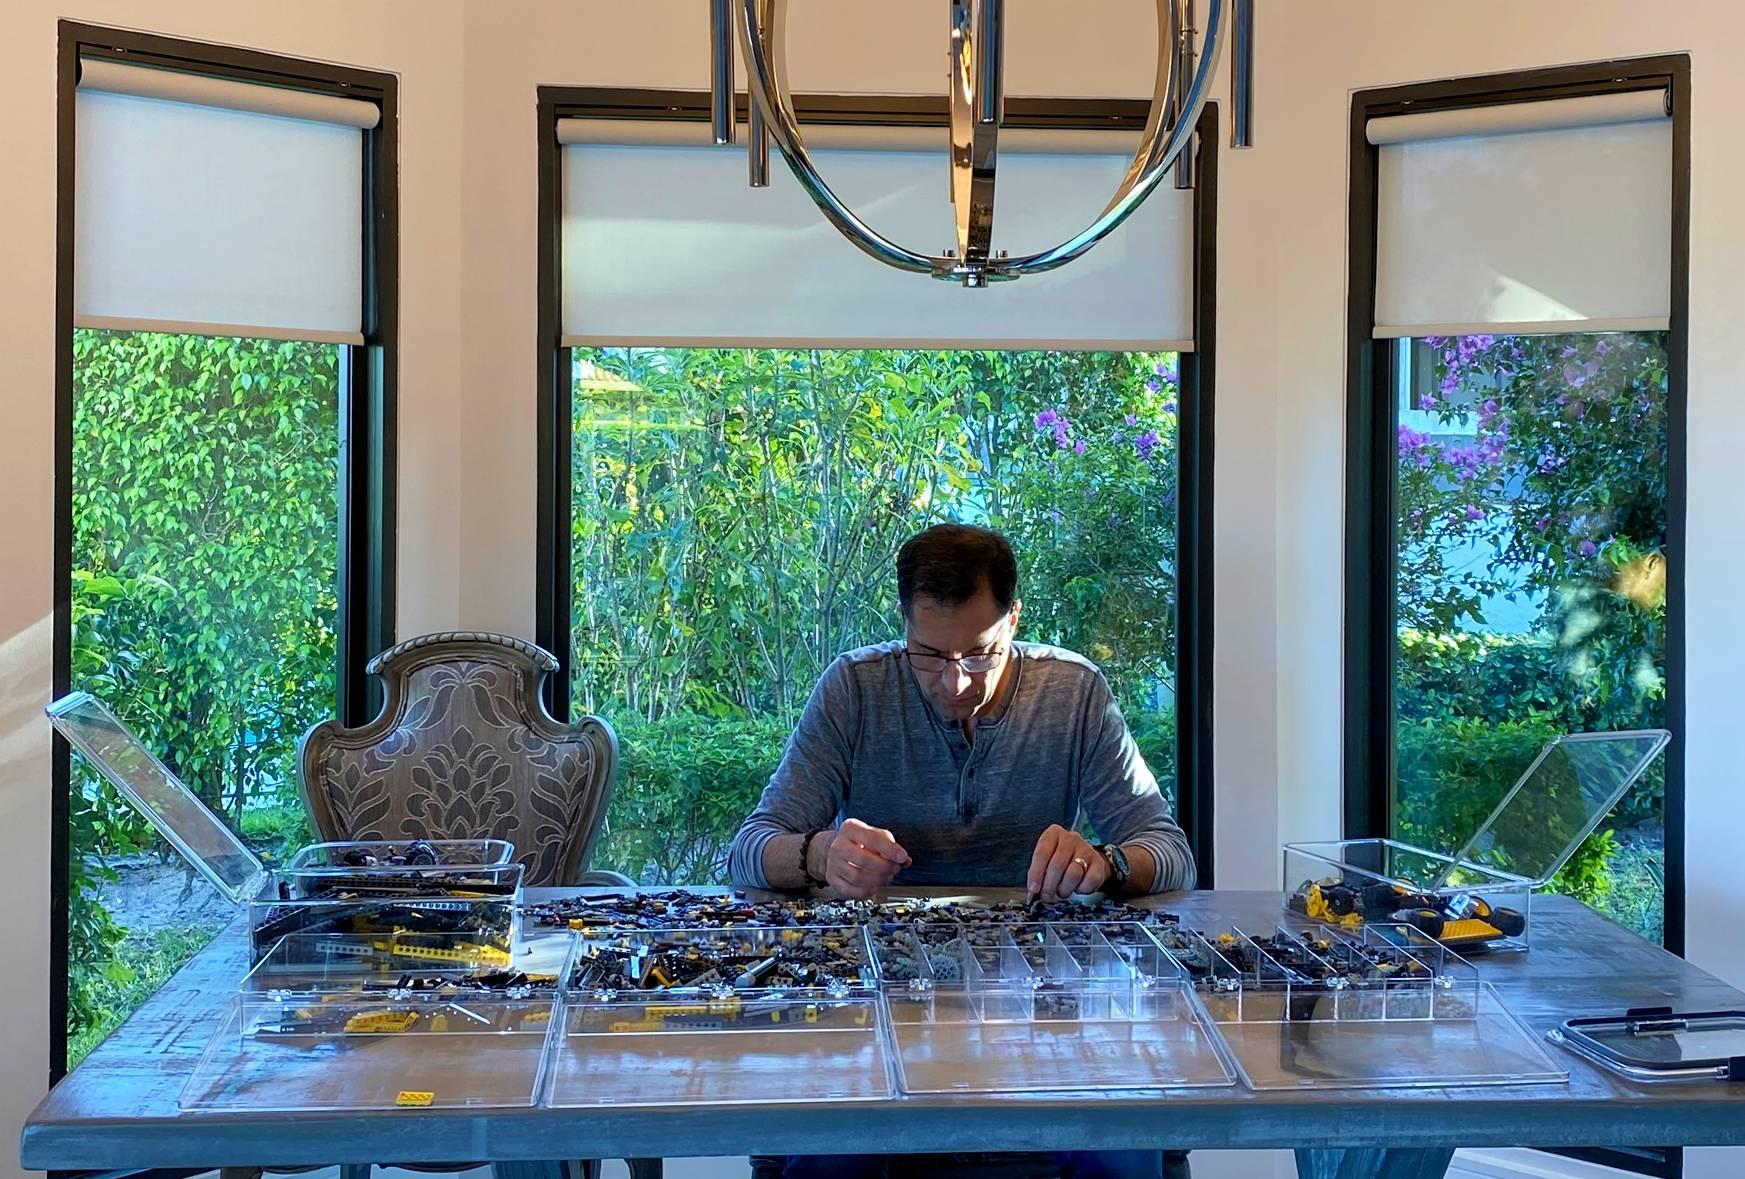 Sorting Legos